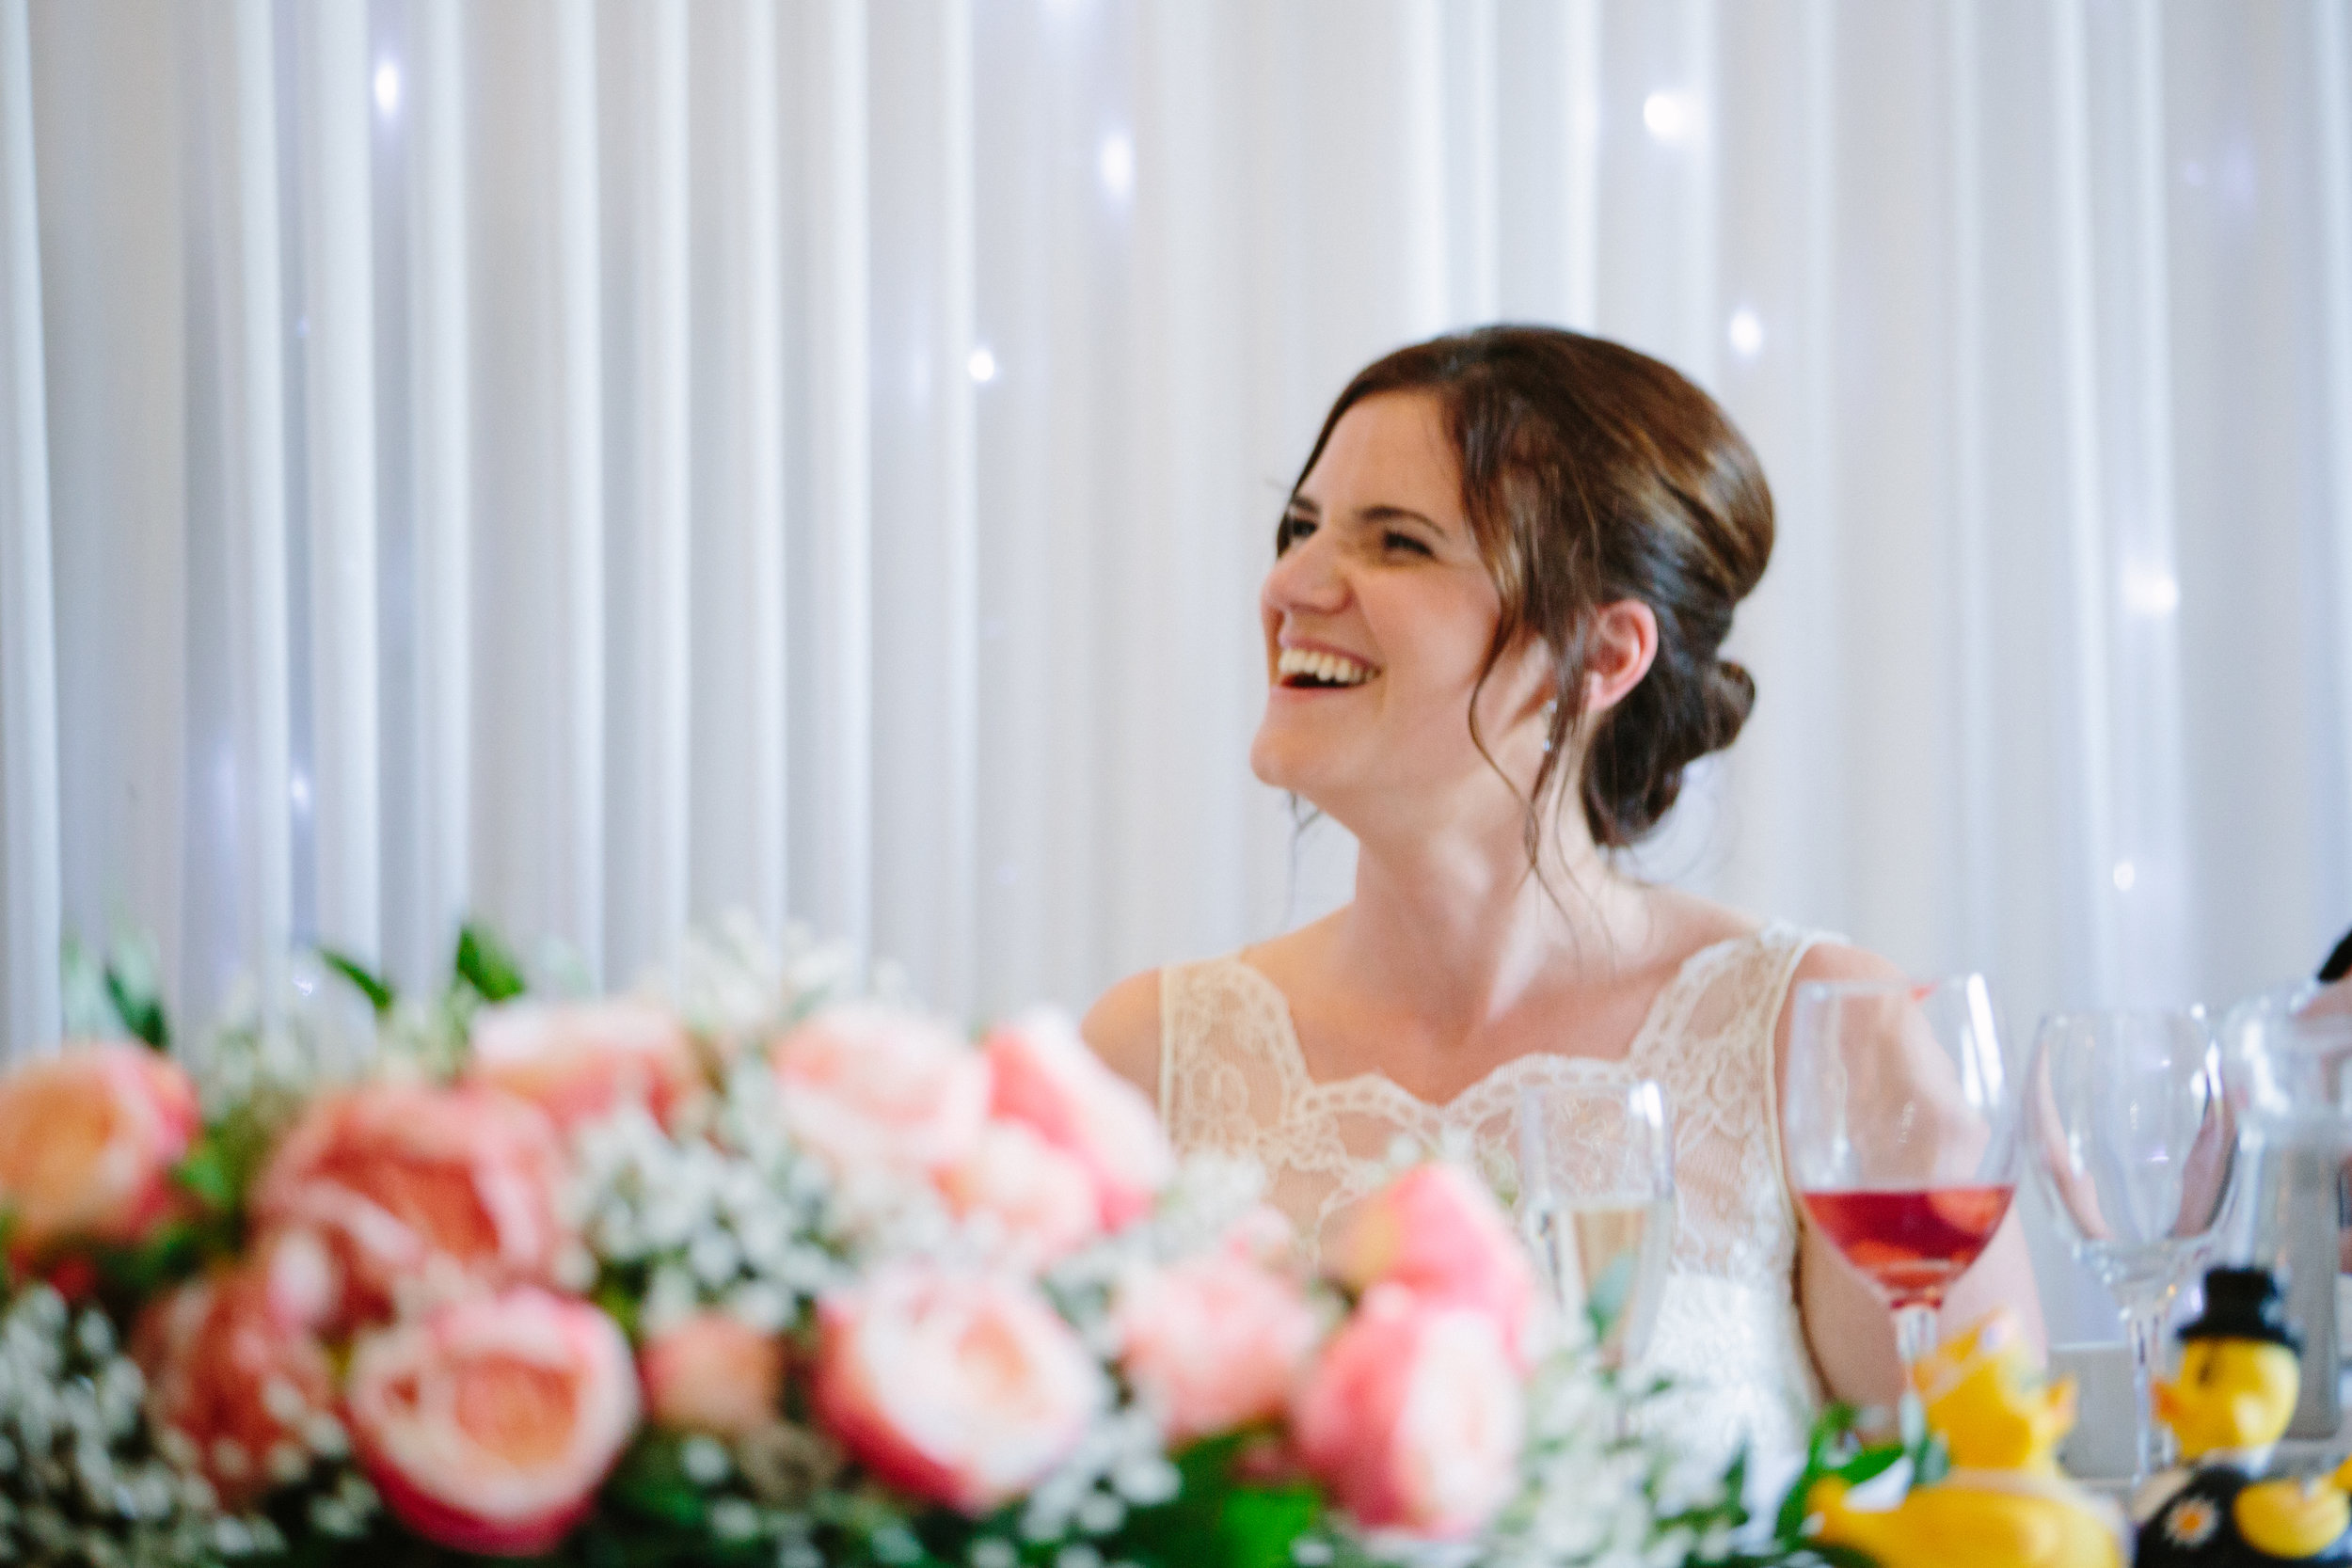 reigate-surrey-london-wedding-photography-group-formal-shot-reception-woldingham-golf-club-speeches